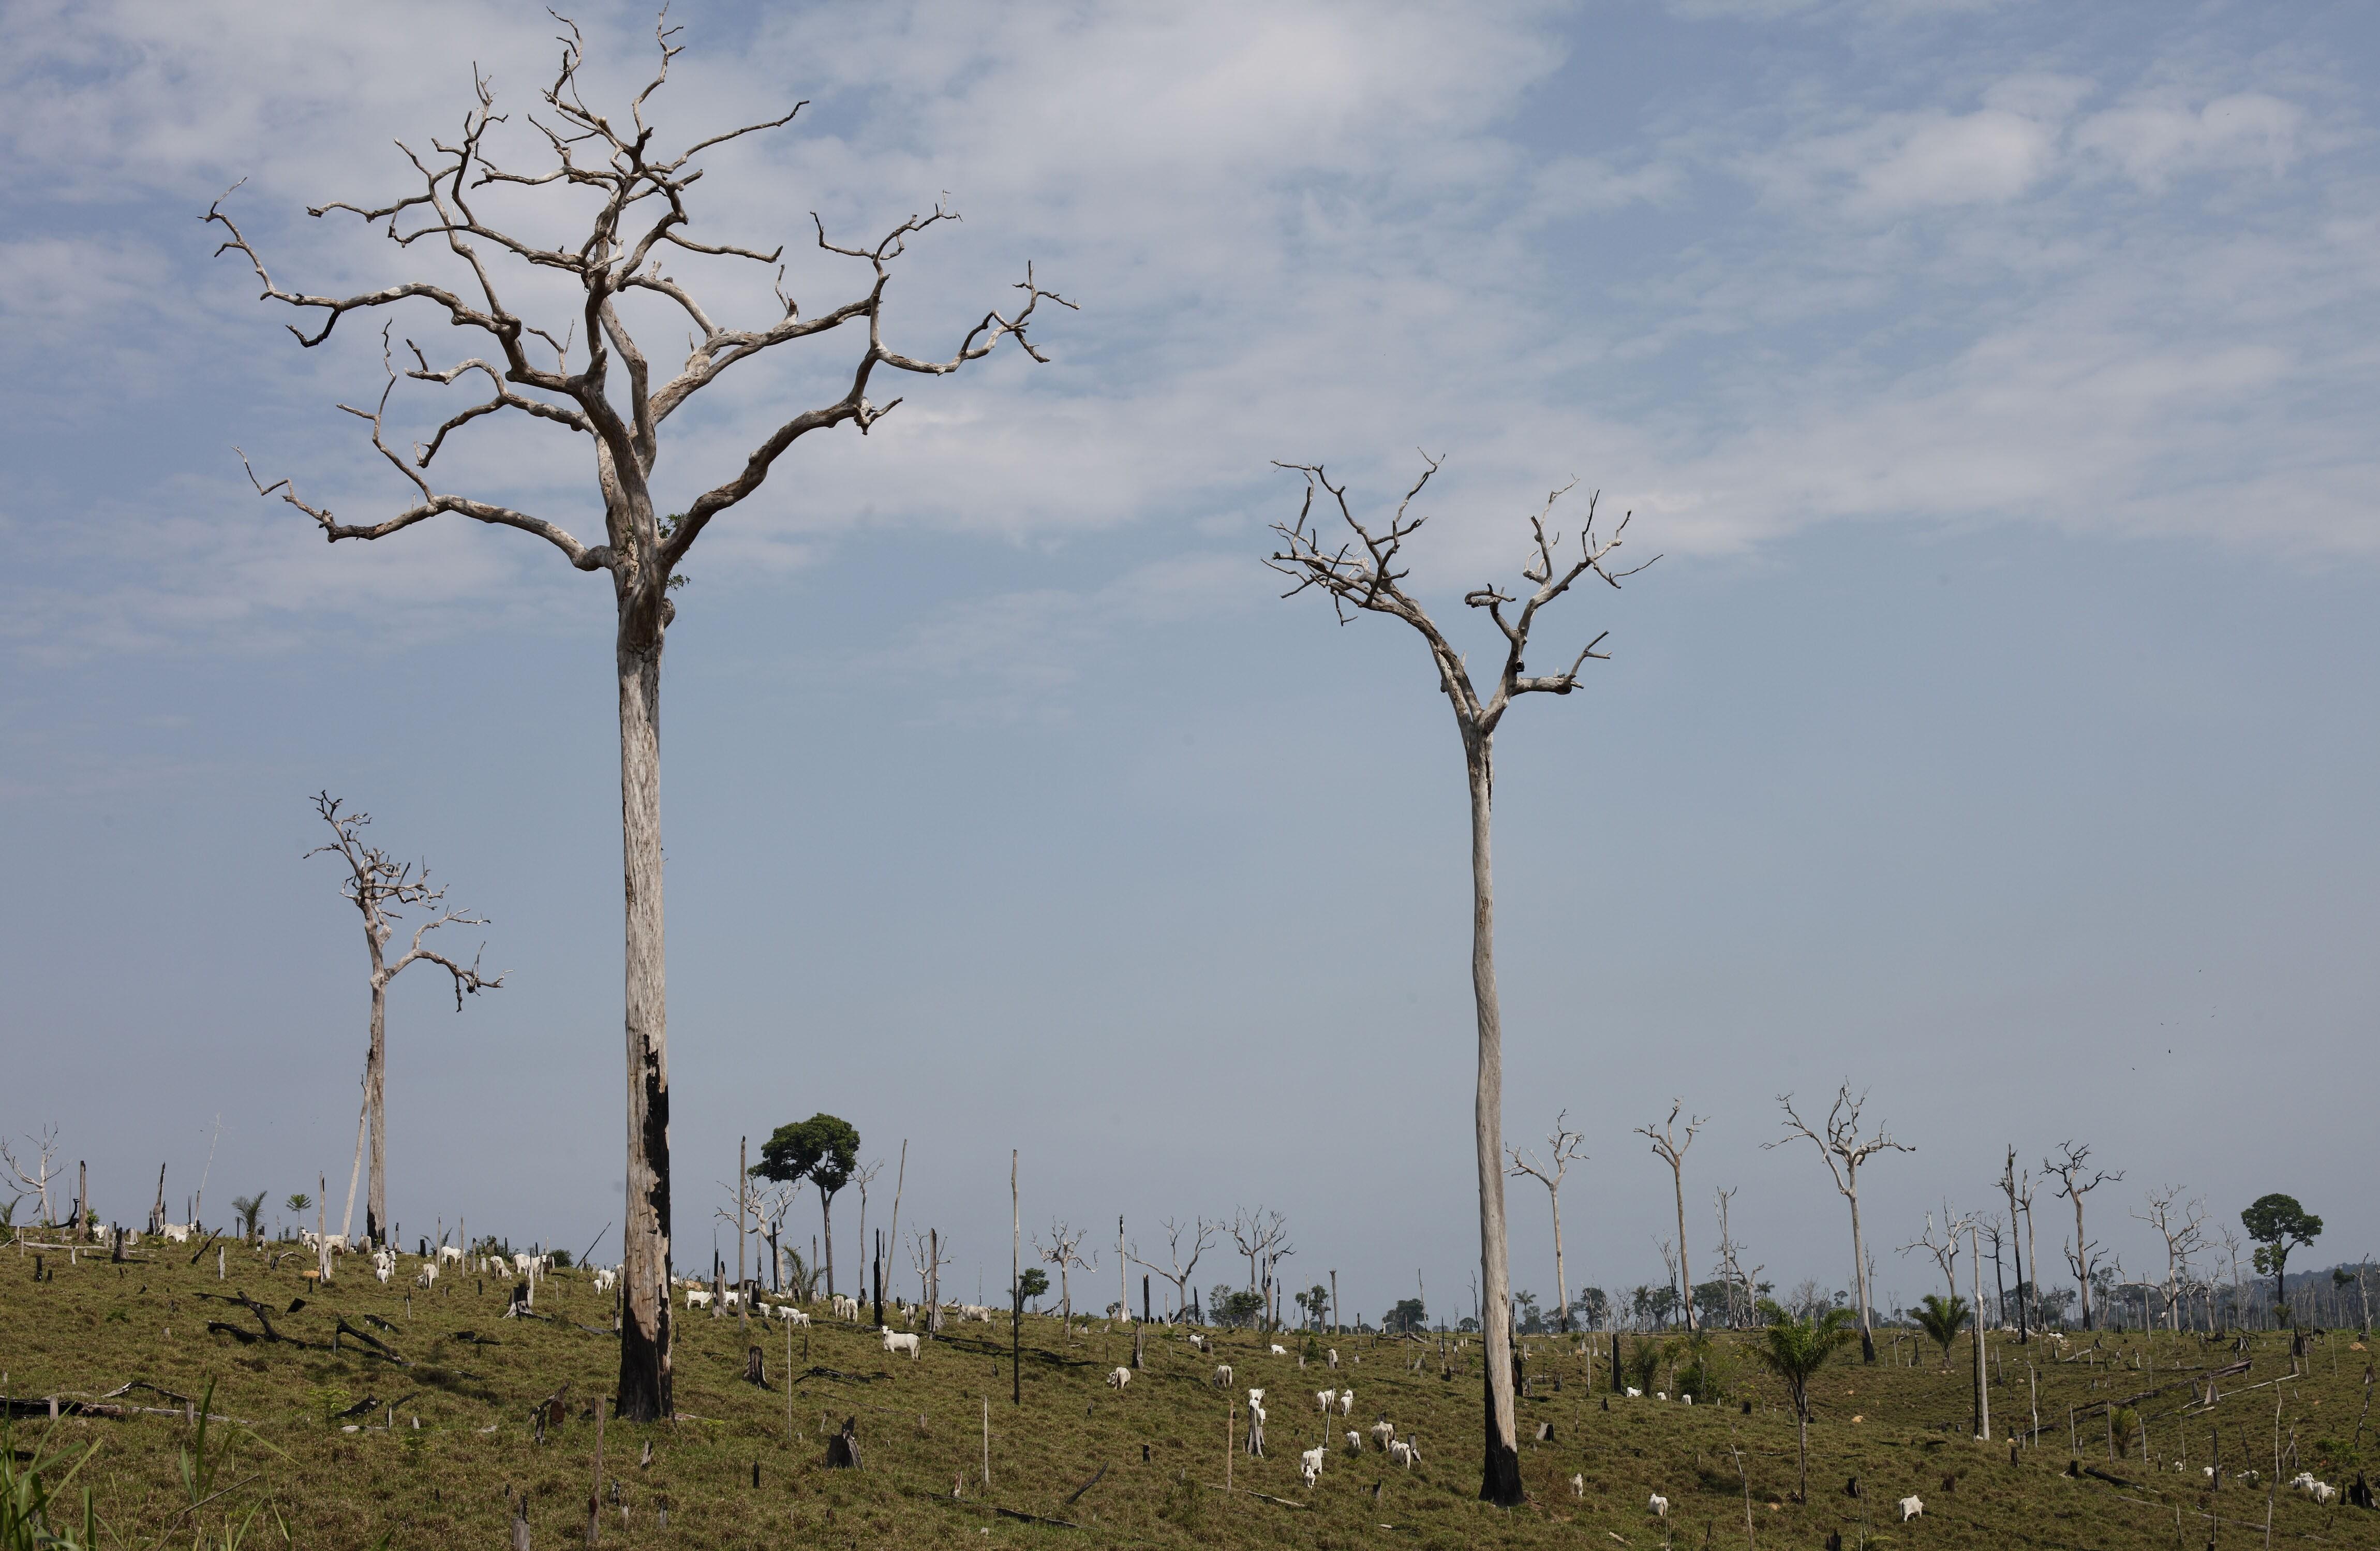 Trump pledges to help plant 1 trillion trees